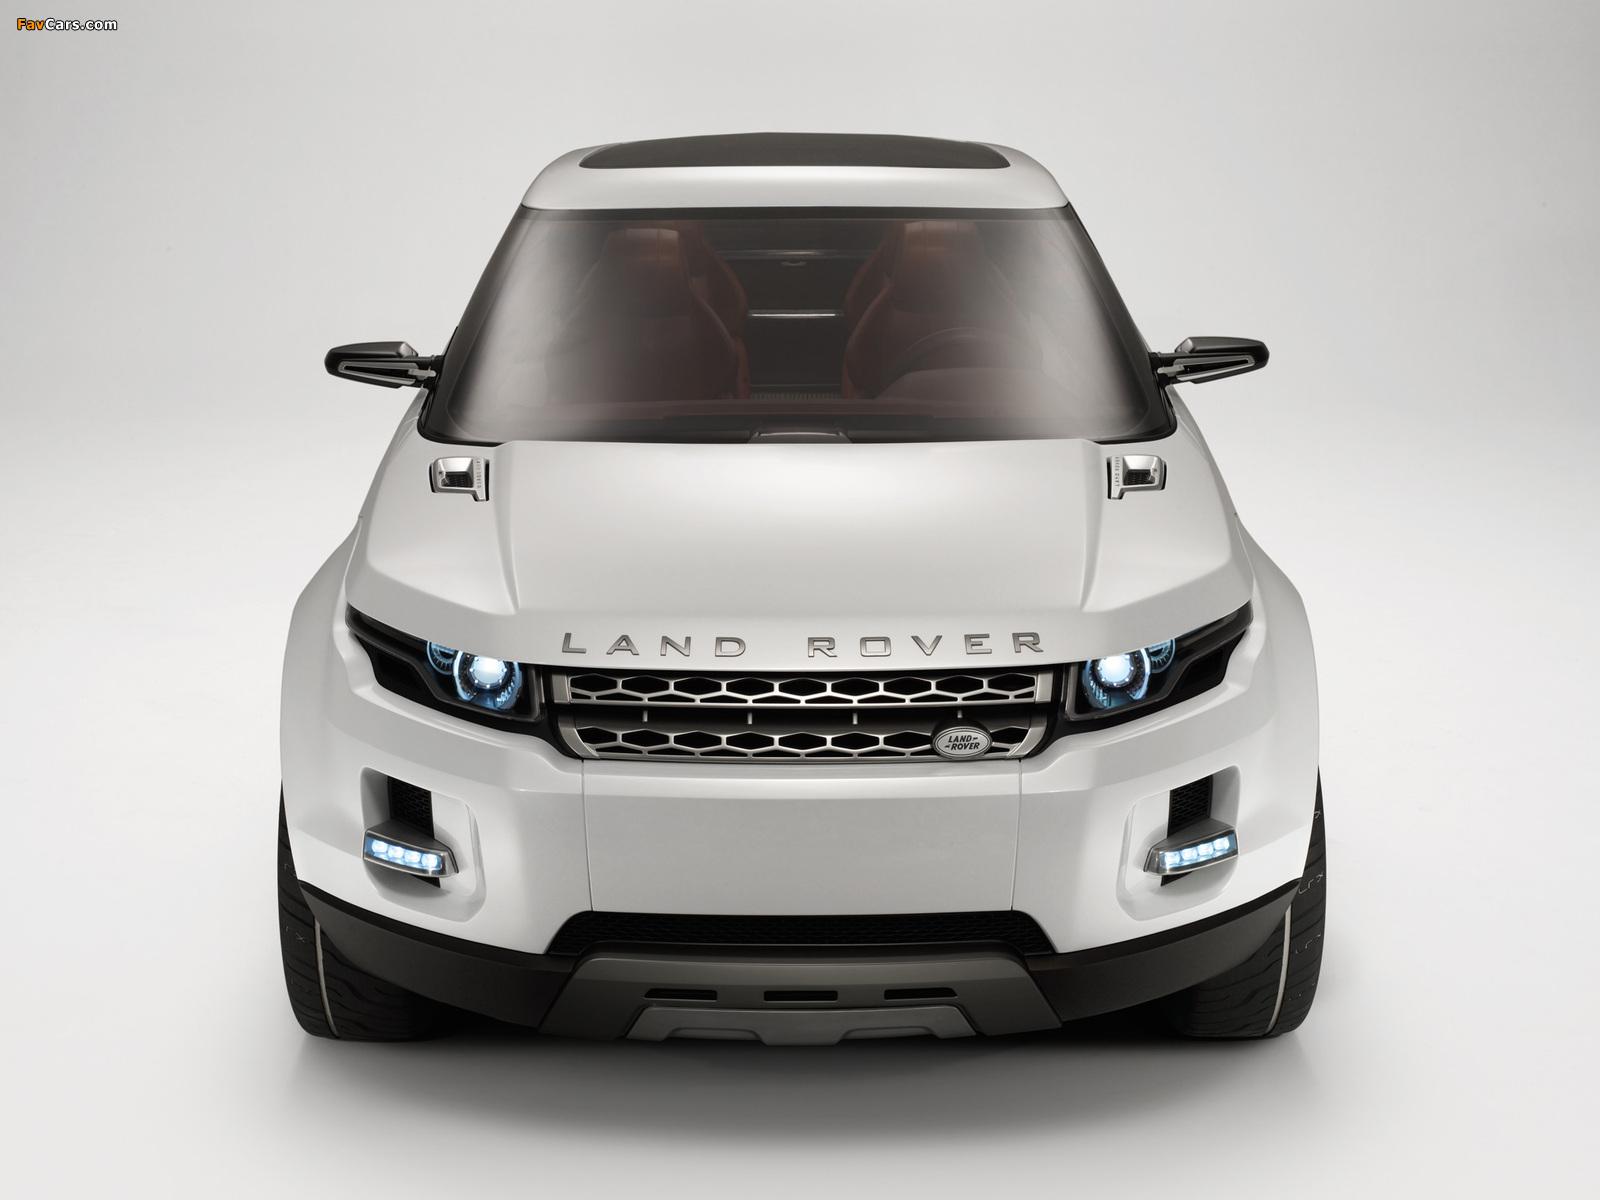 Land Rover LRX Concept 2007 pictures (1600 x 1200)